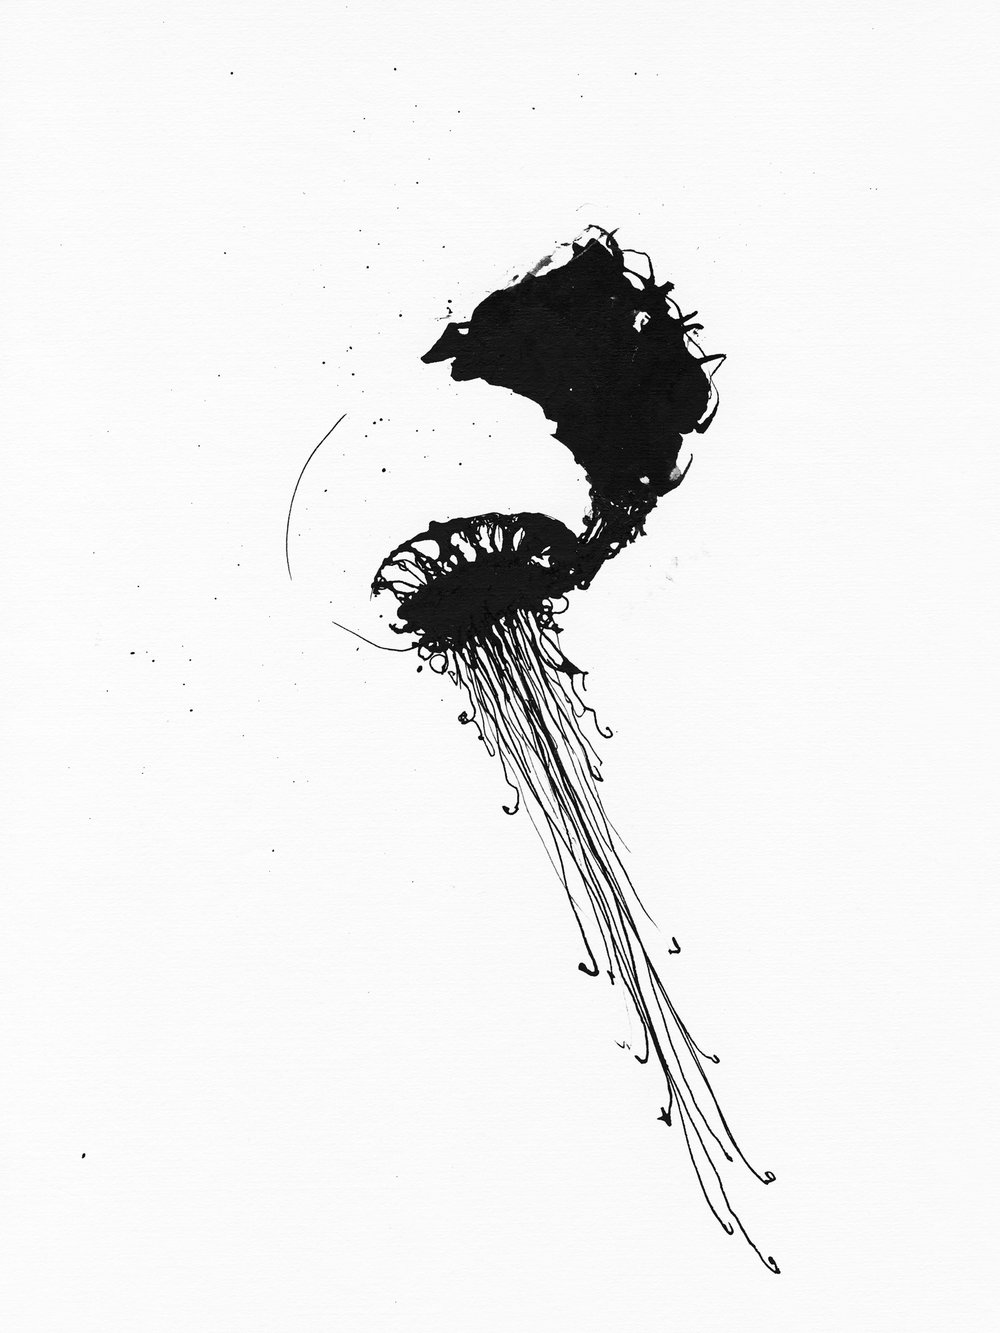 Jellyfish_1_11x14.jpg